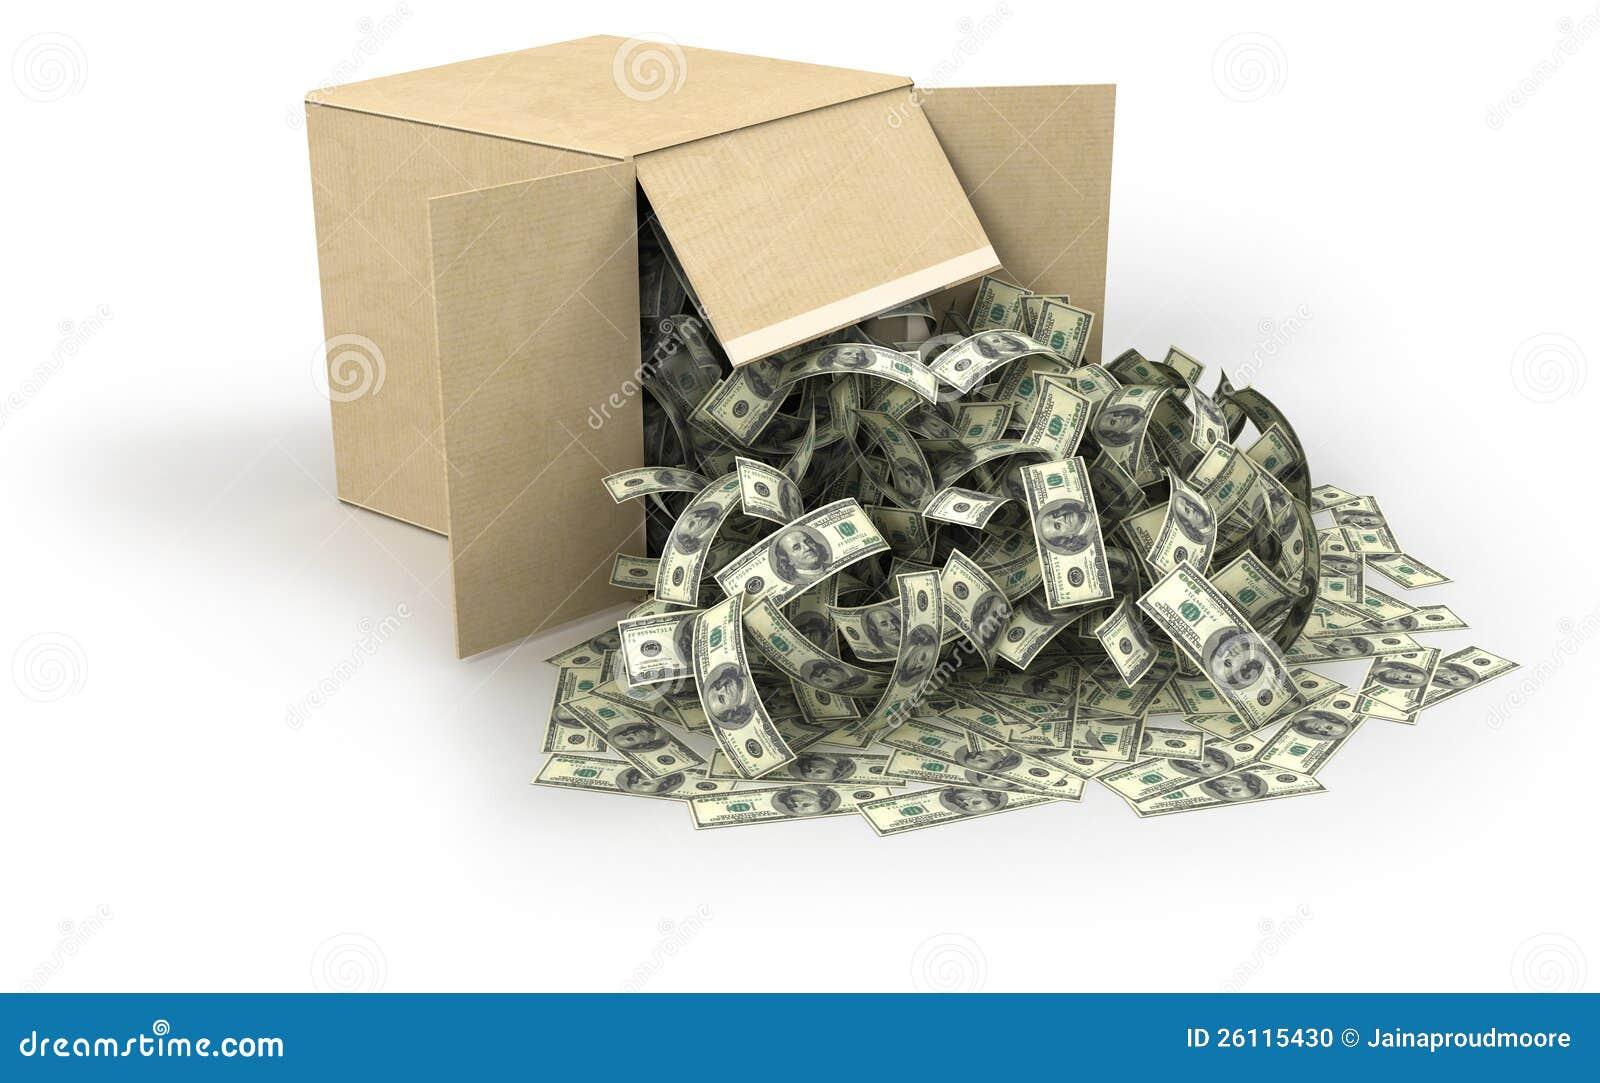 box of money stock photo image 26115430 dollar bill clip art free printable dollar bill clip art free